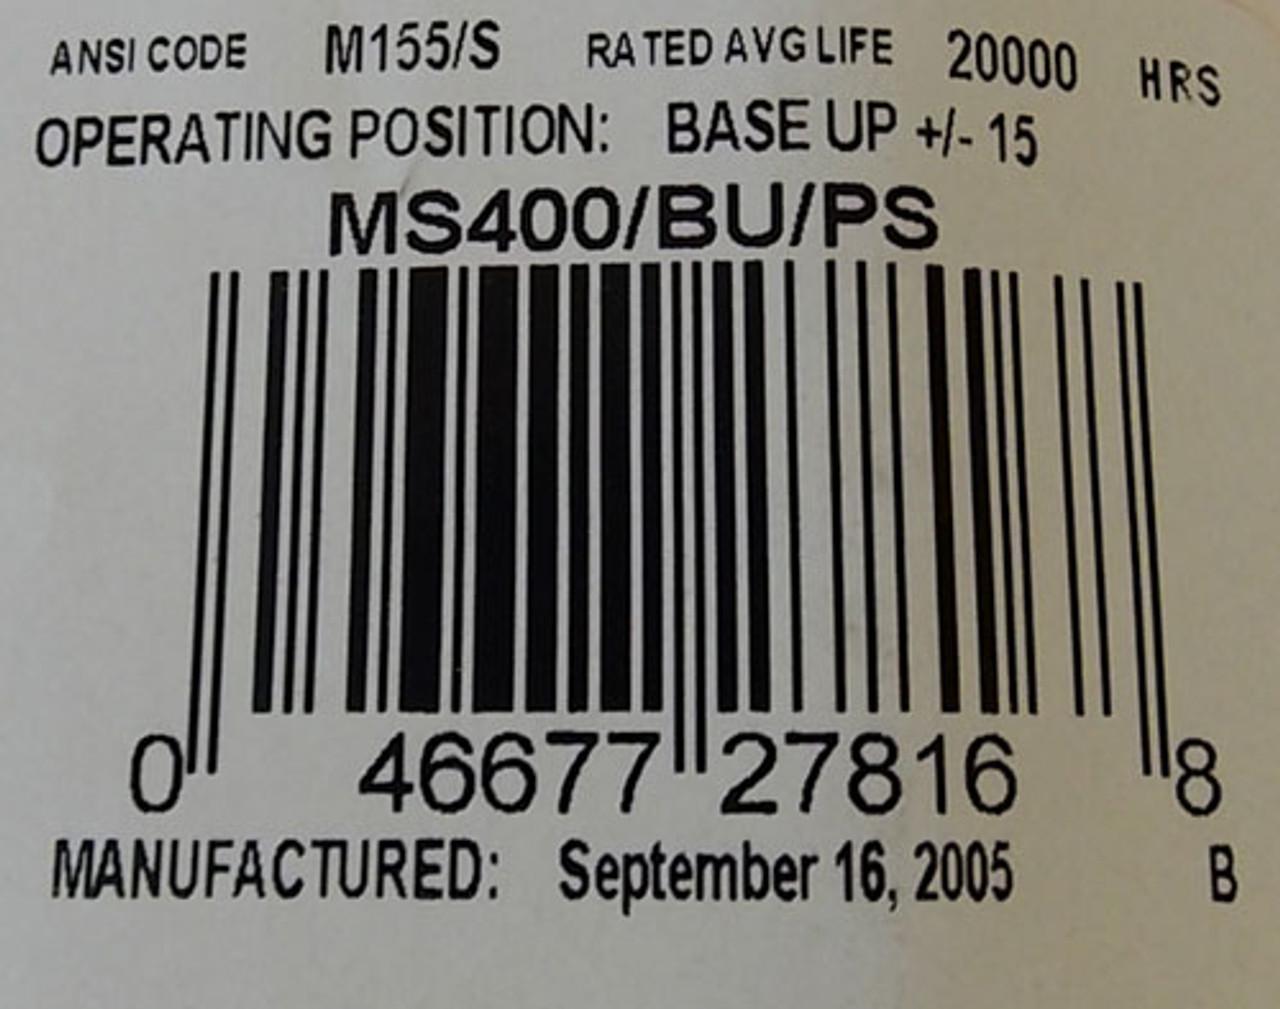 Philips MS400/BU/PS 400W Clear M155/S Metal Halide Light Bulb